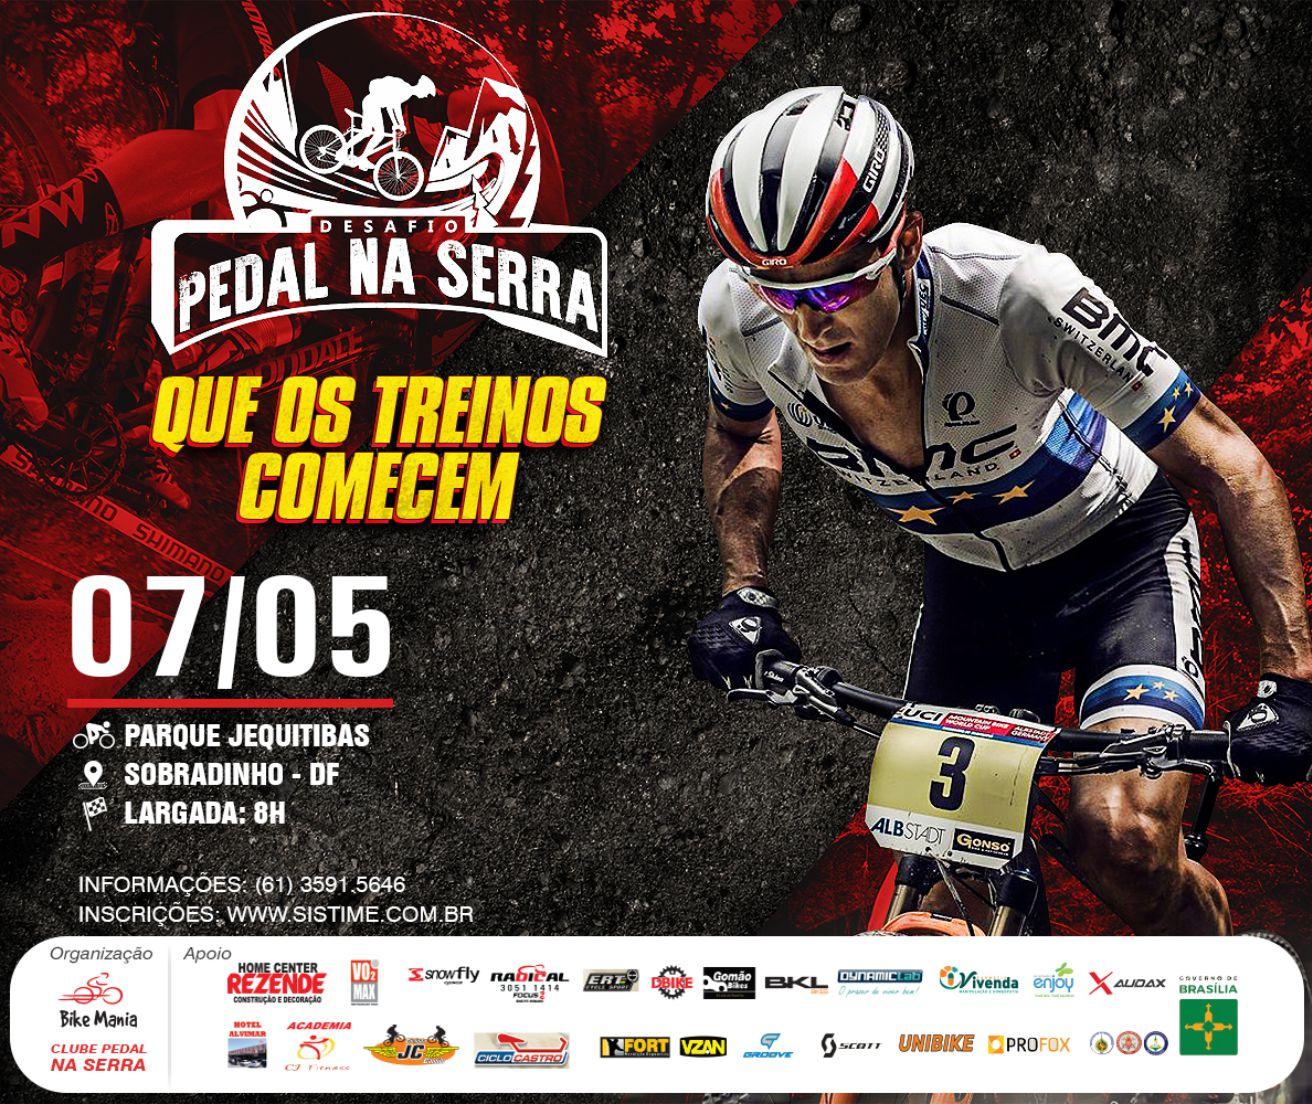 80km-pedal-na-serra-2017-cartaz2